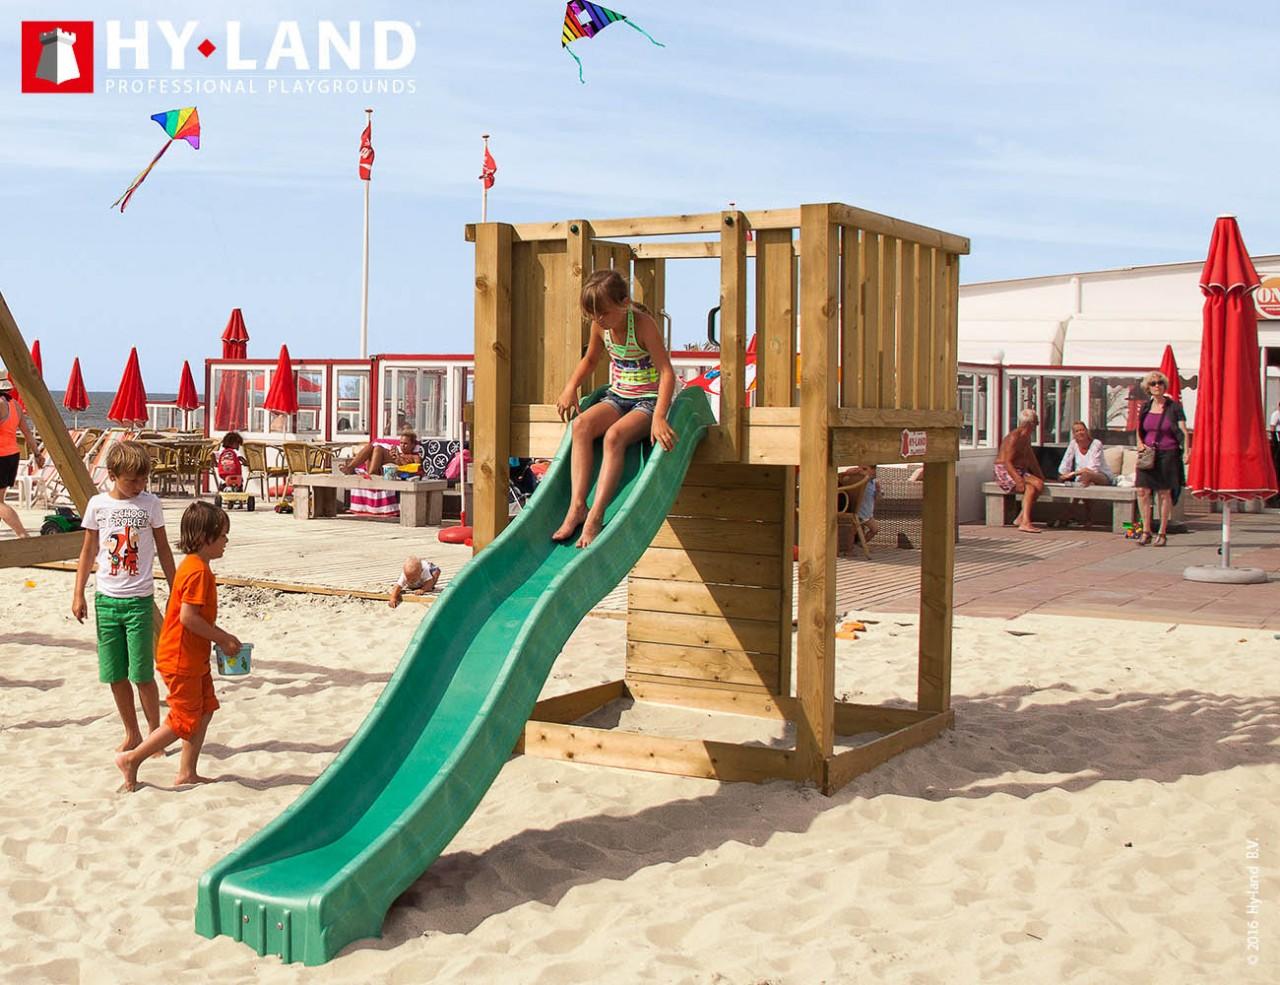 Spielturm Hy-Land P1